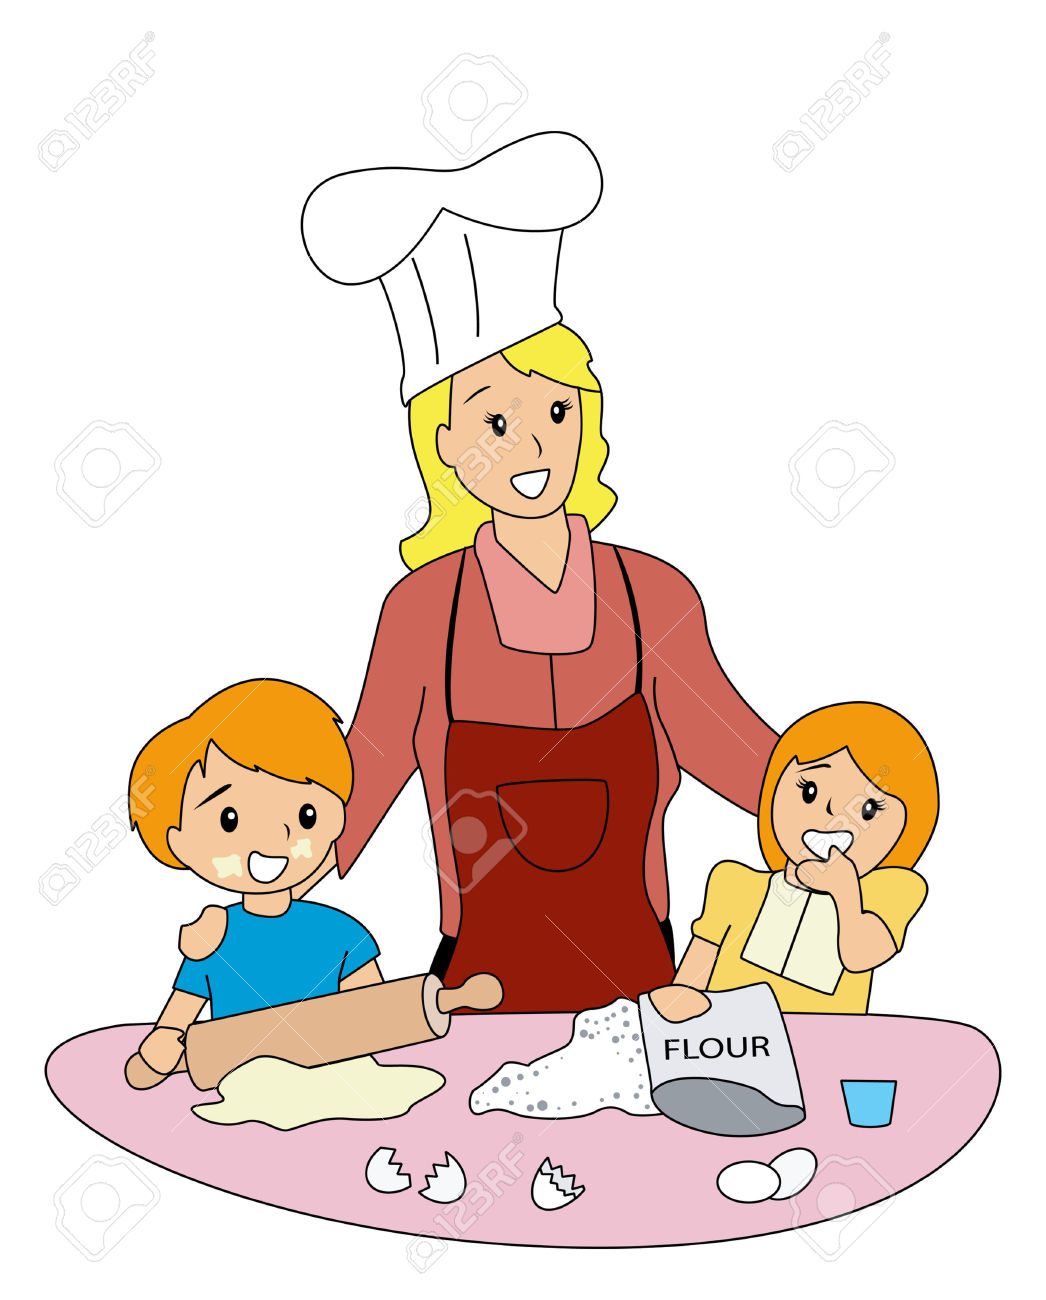 Kochen kinder clipart clipart freeuse stock Kochen und backen mit kindern clipart - ClipartFest clipart freeuse stock